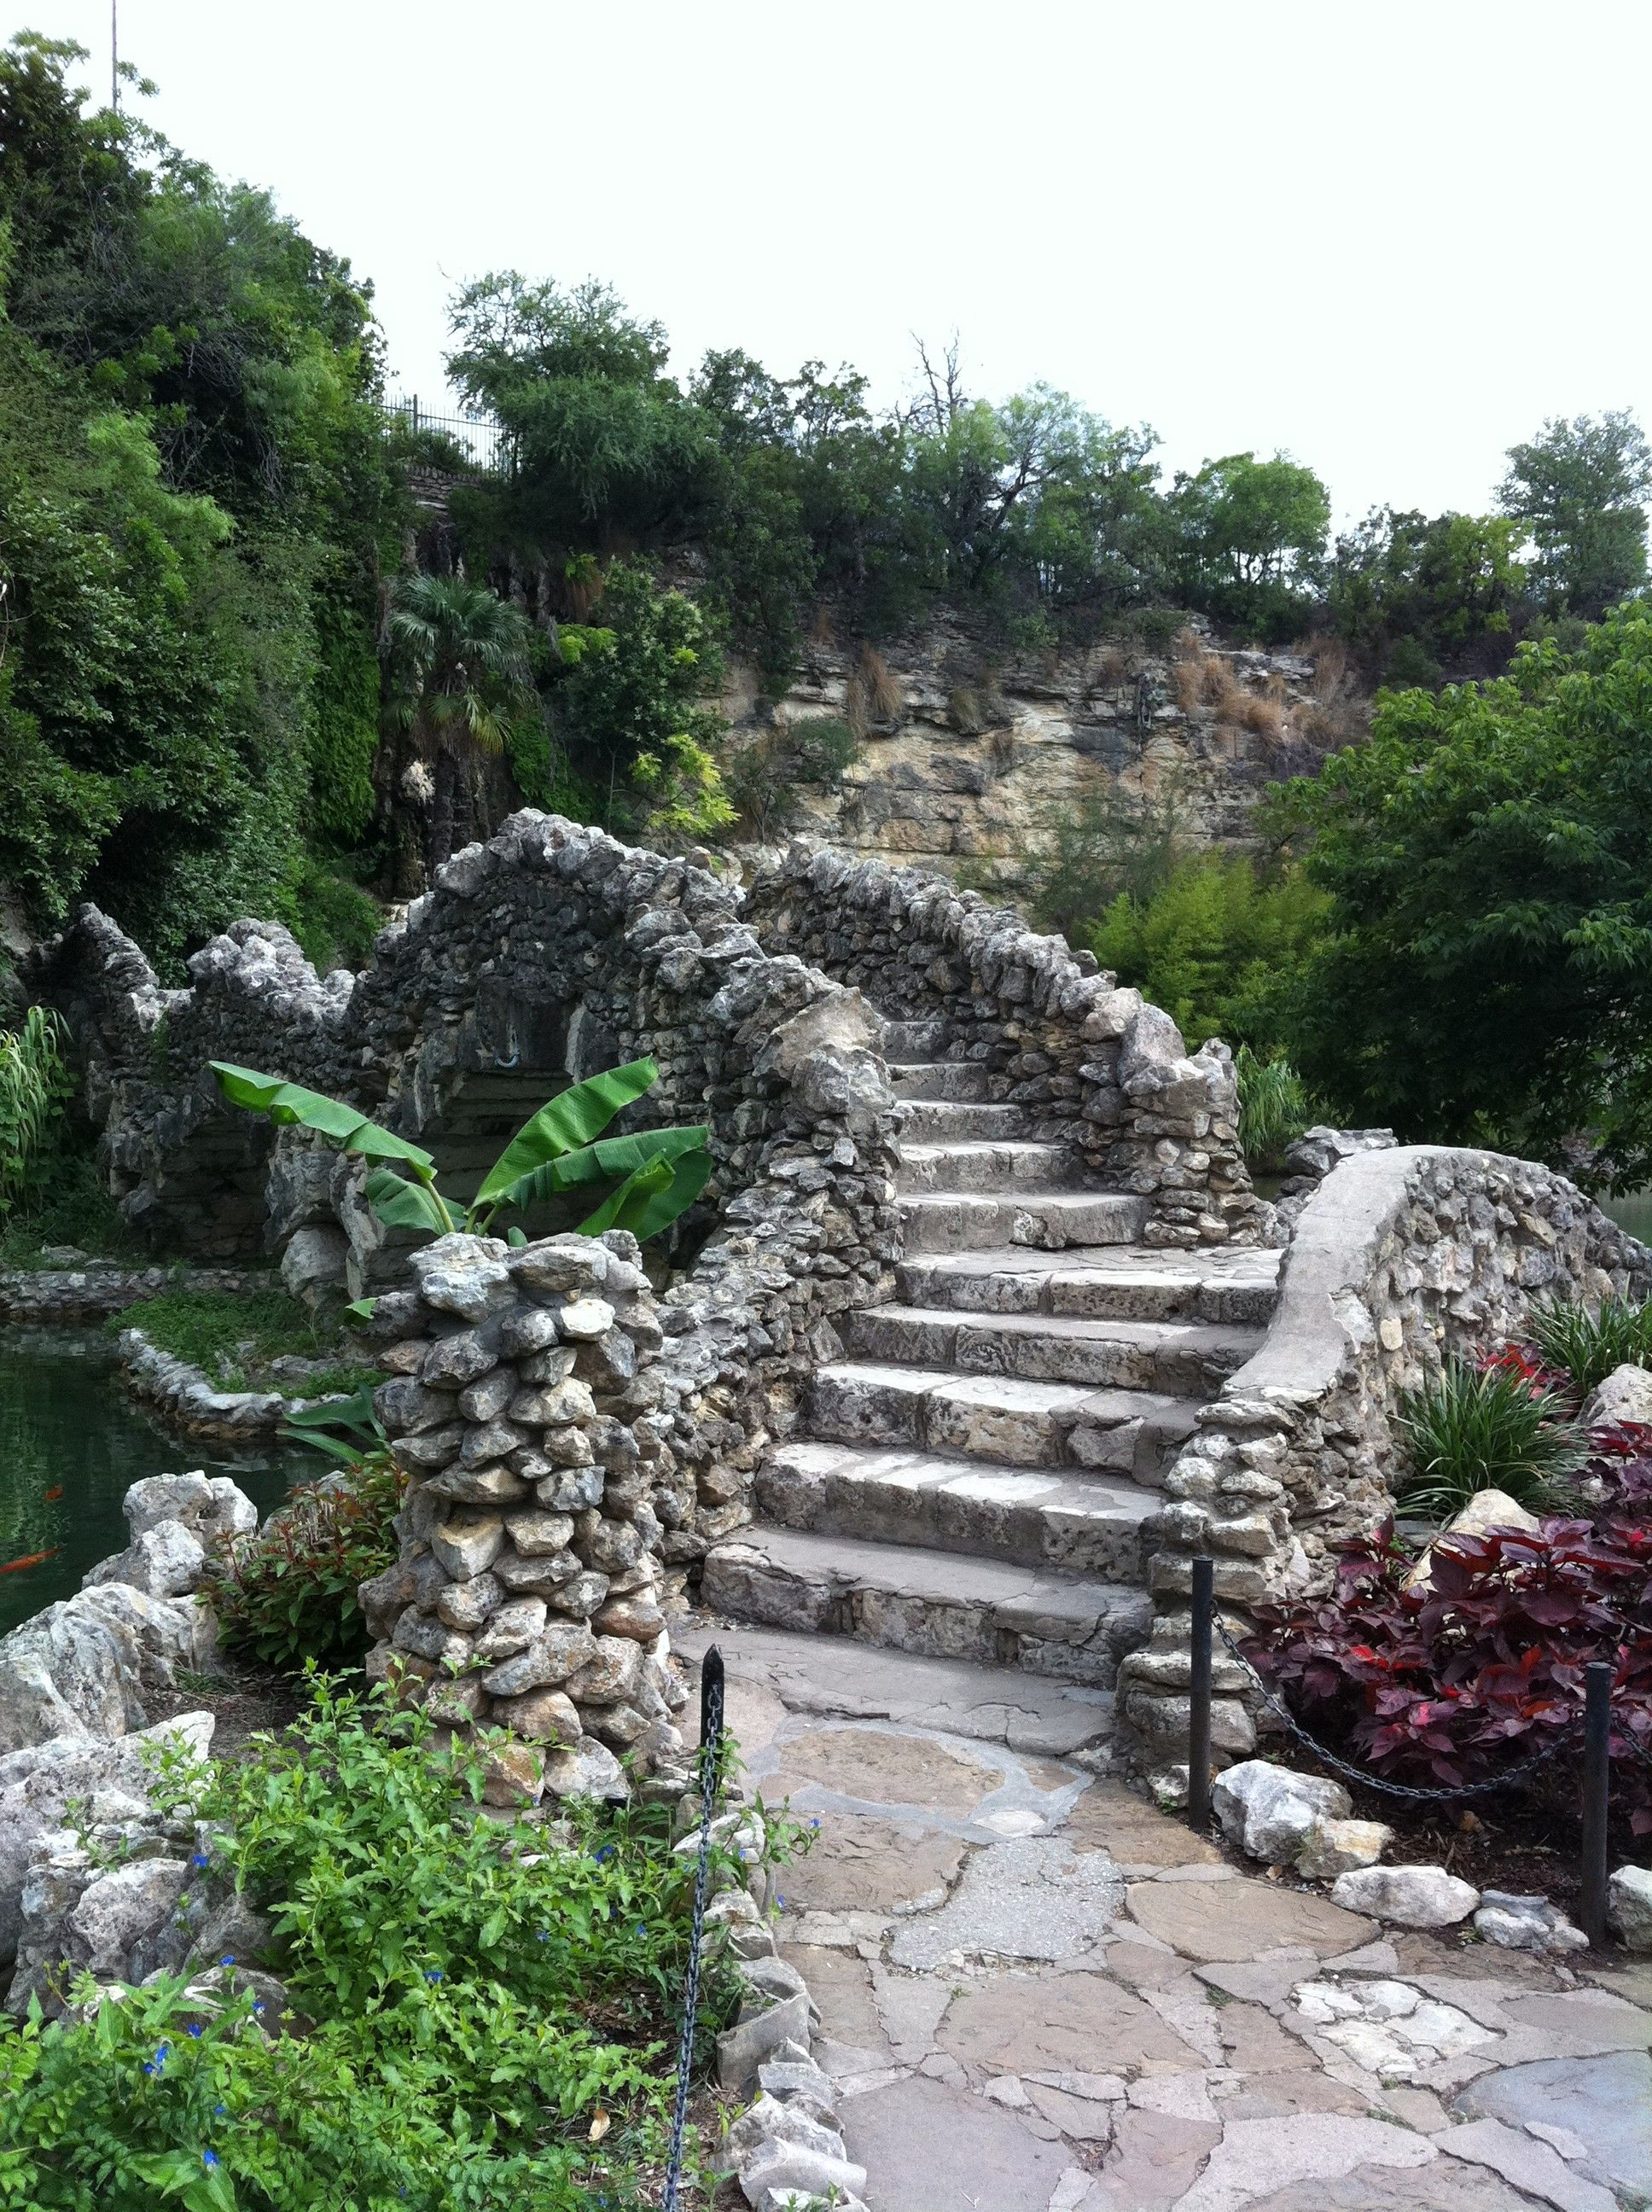 392711c18ee7690100b4b671b183d3e4 - Things To Do In Tea Gardens